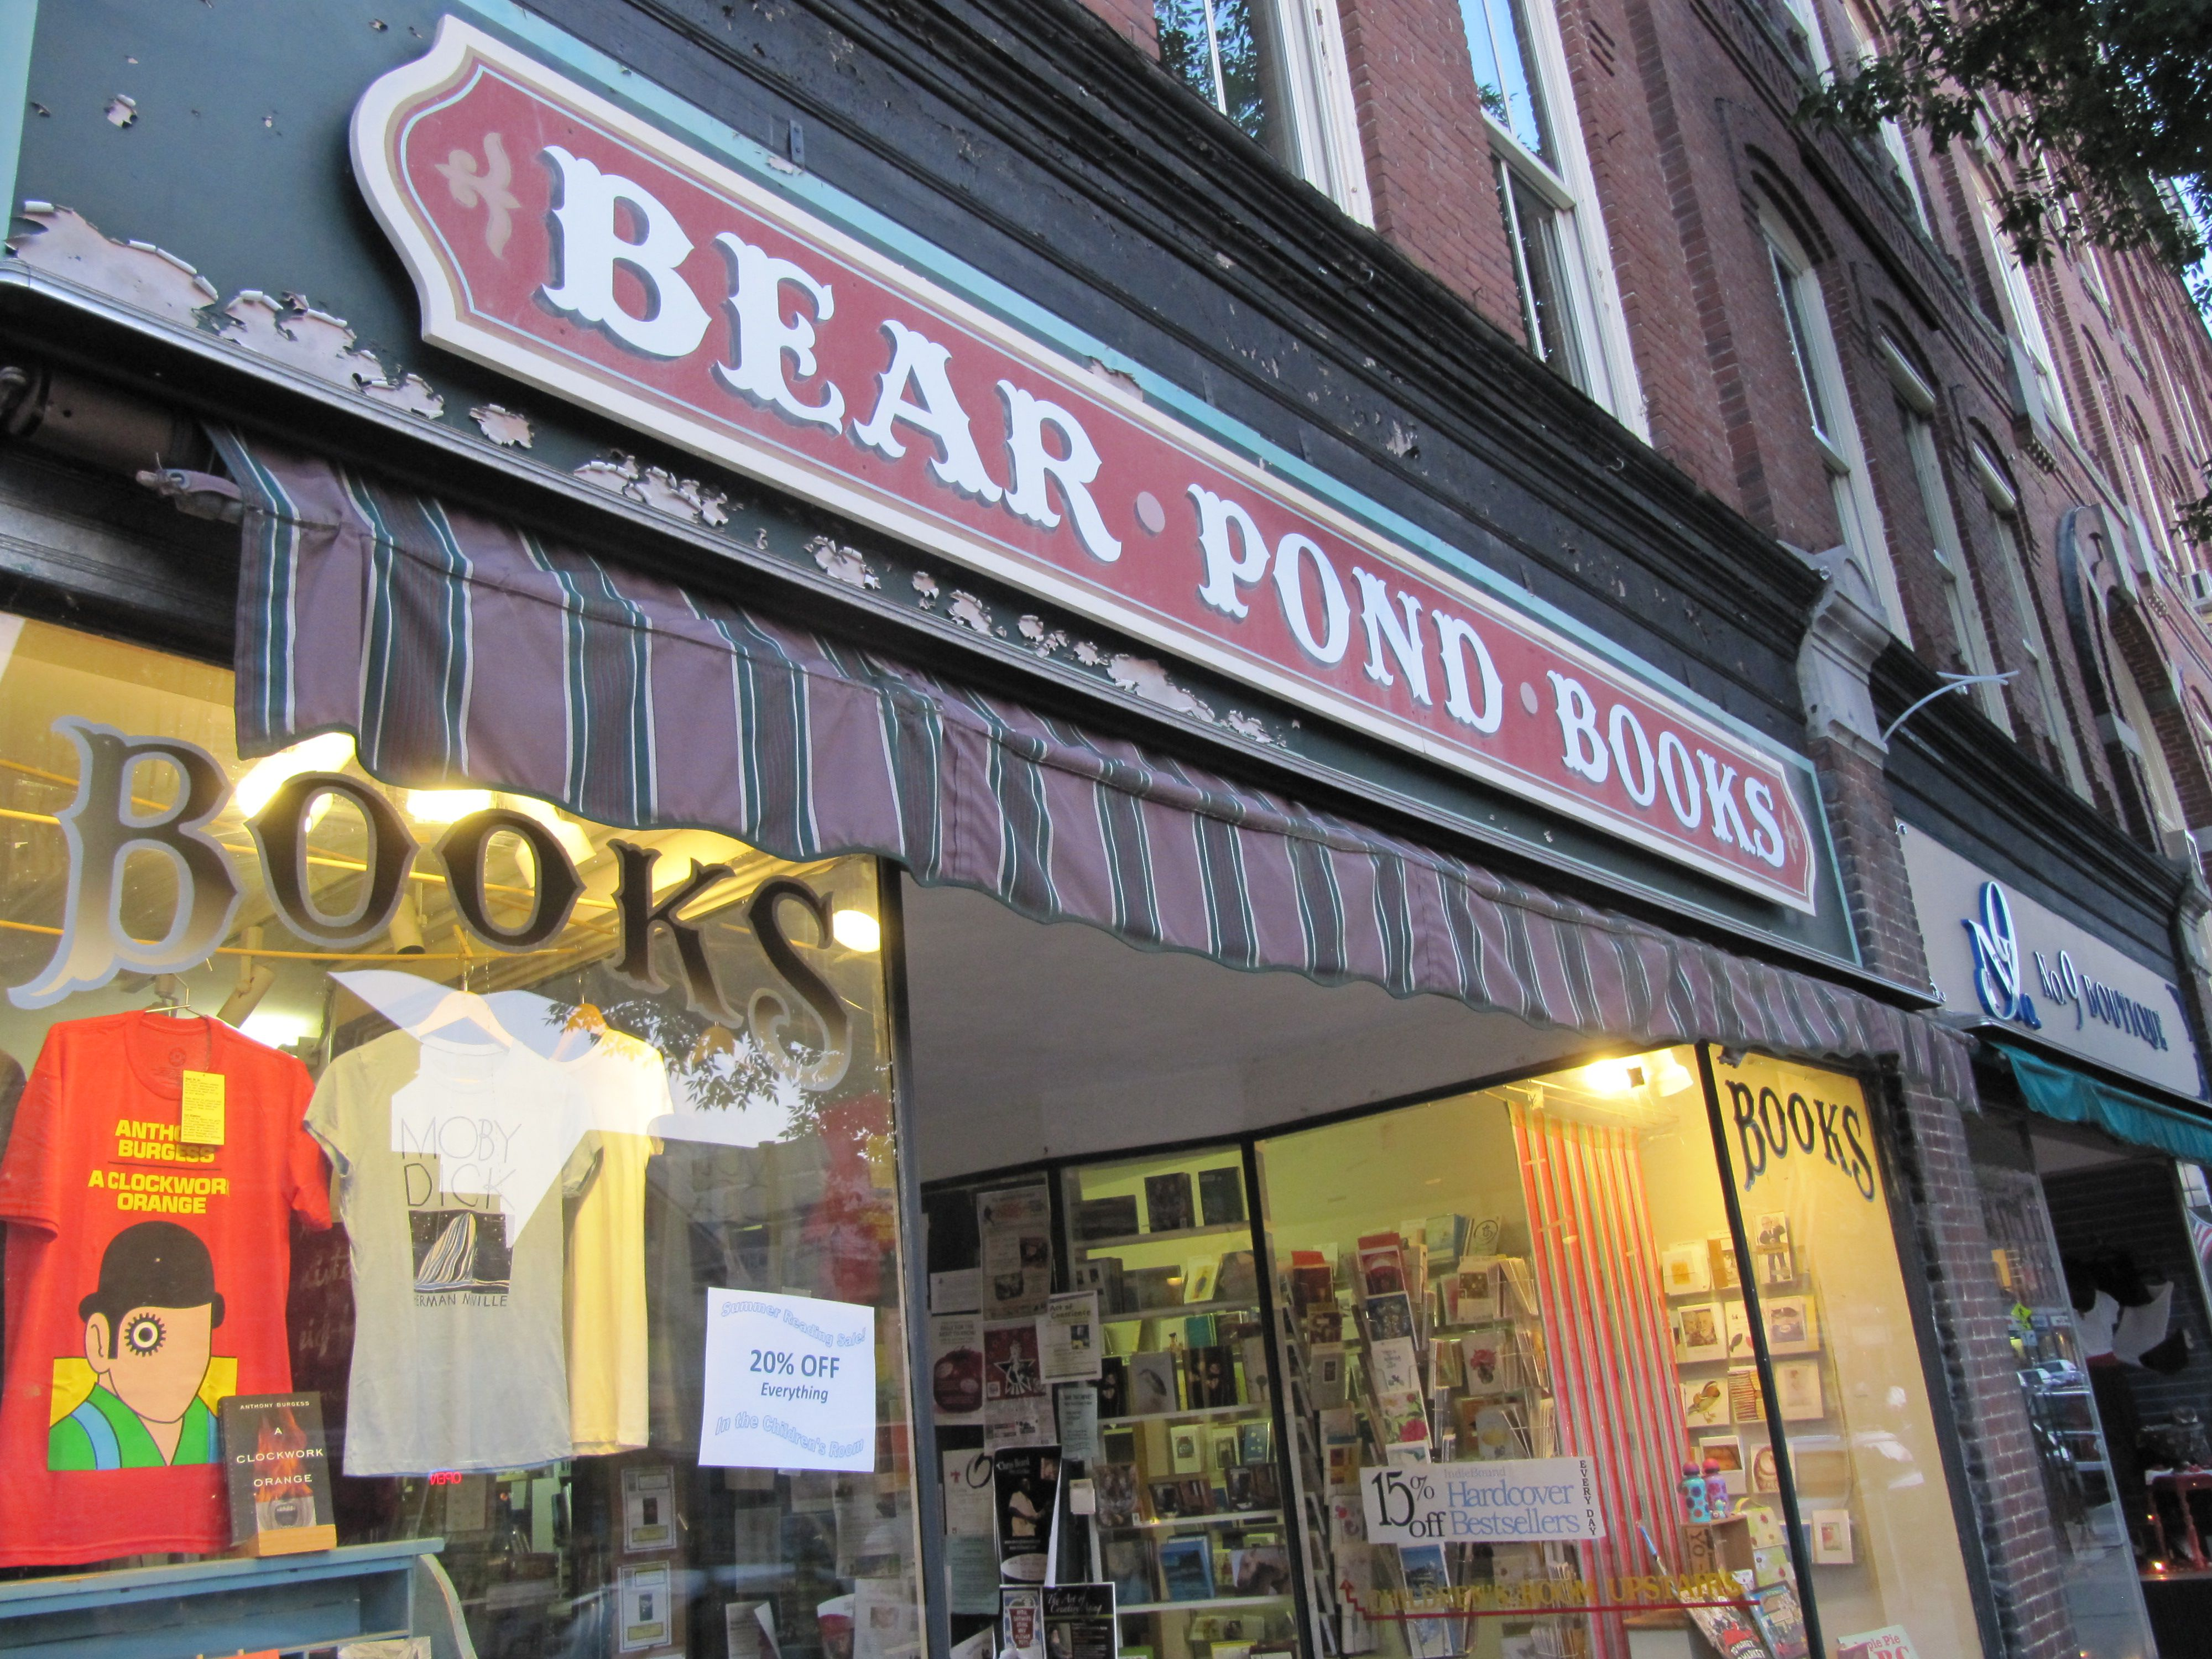 Bear Pond Books in Montpelier